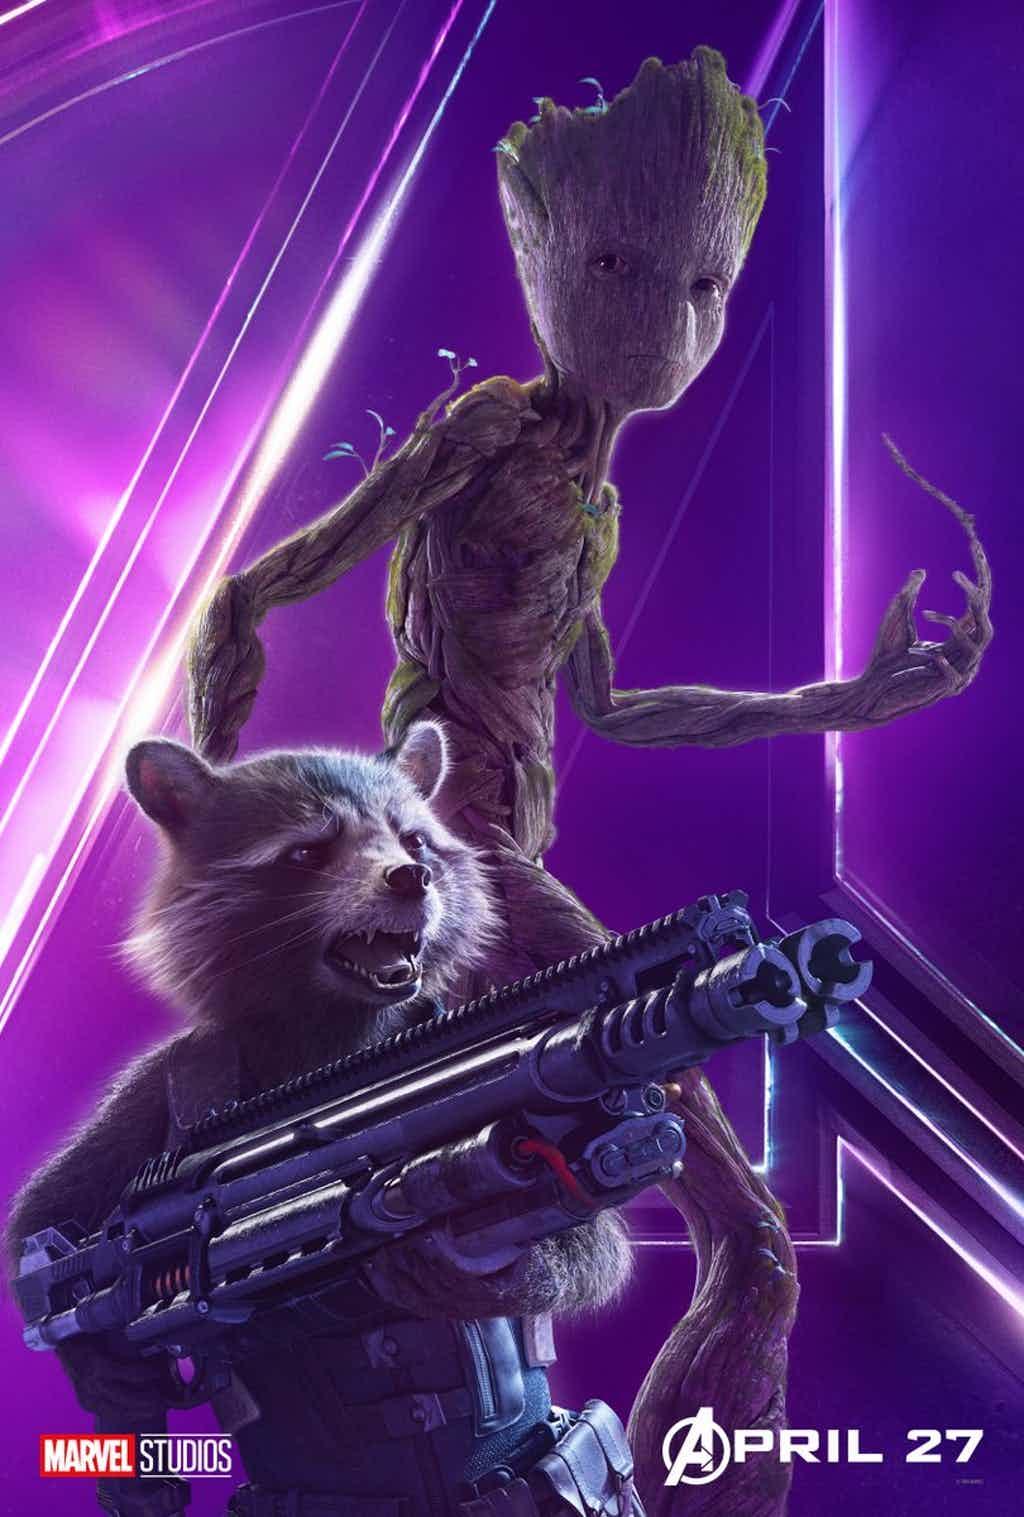 szmk_marvel_infinity_war_vegtelen_haboru_bosszuallok_avengers_ironman_hulk_thor_captainamaerica_guardians_galaxy_13.jpg